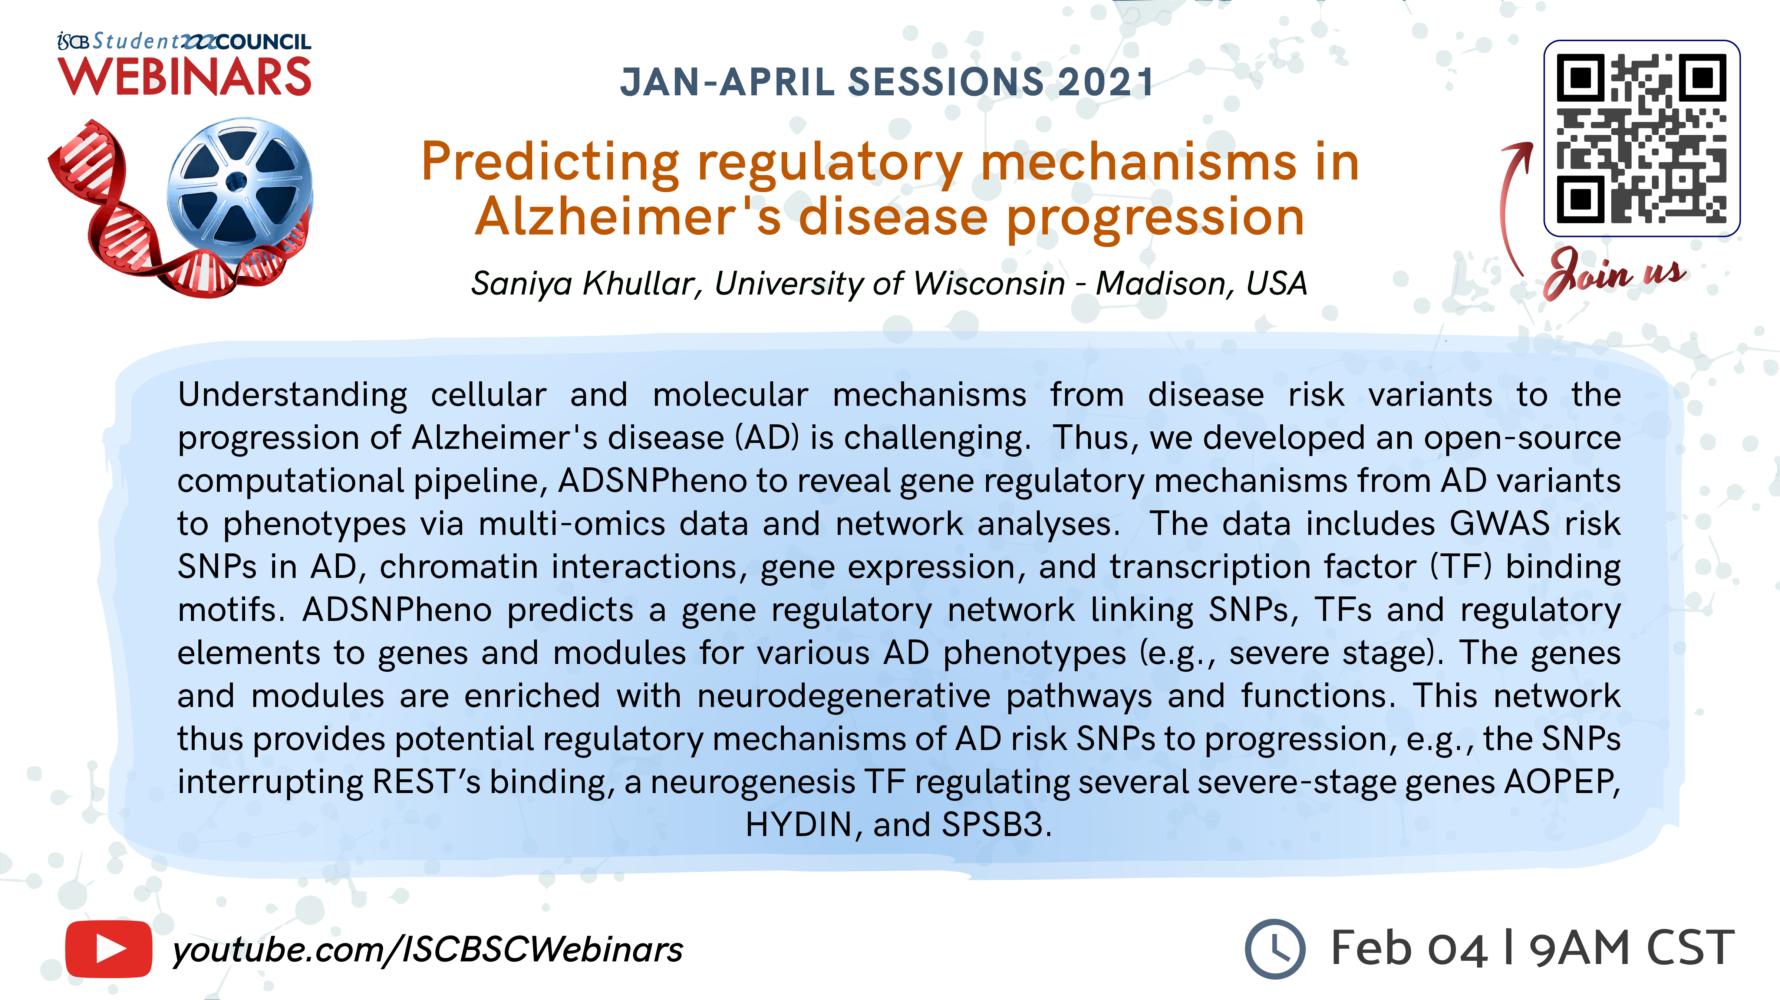 Predicting regulatory mechanisms in Alzheimer's disease progression